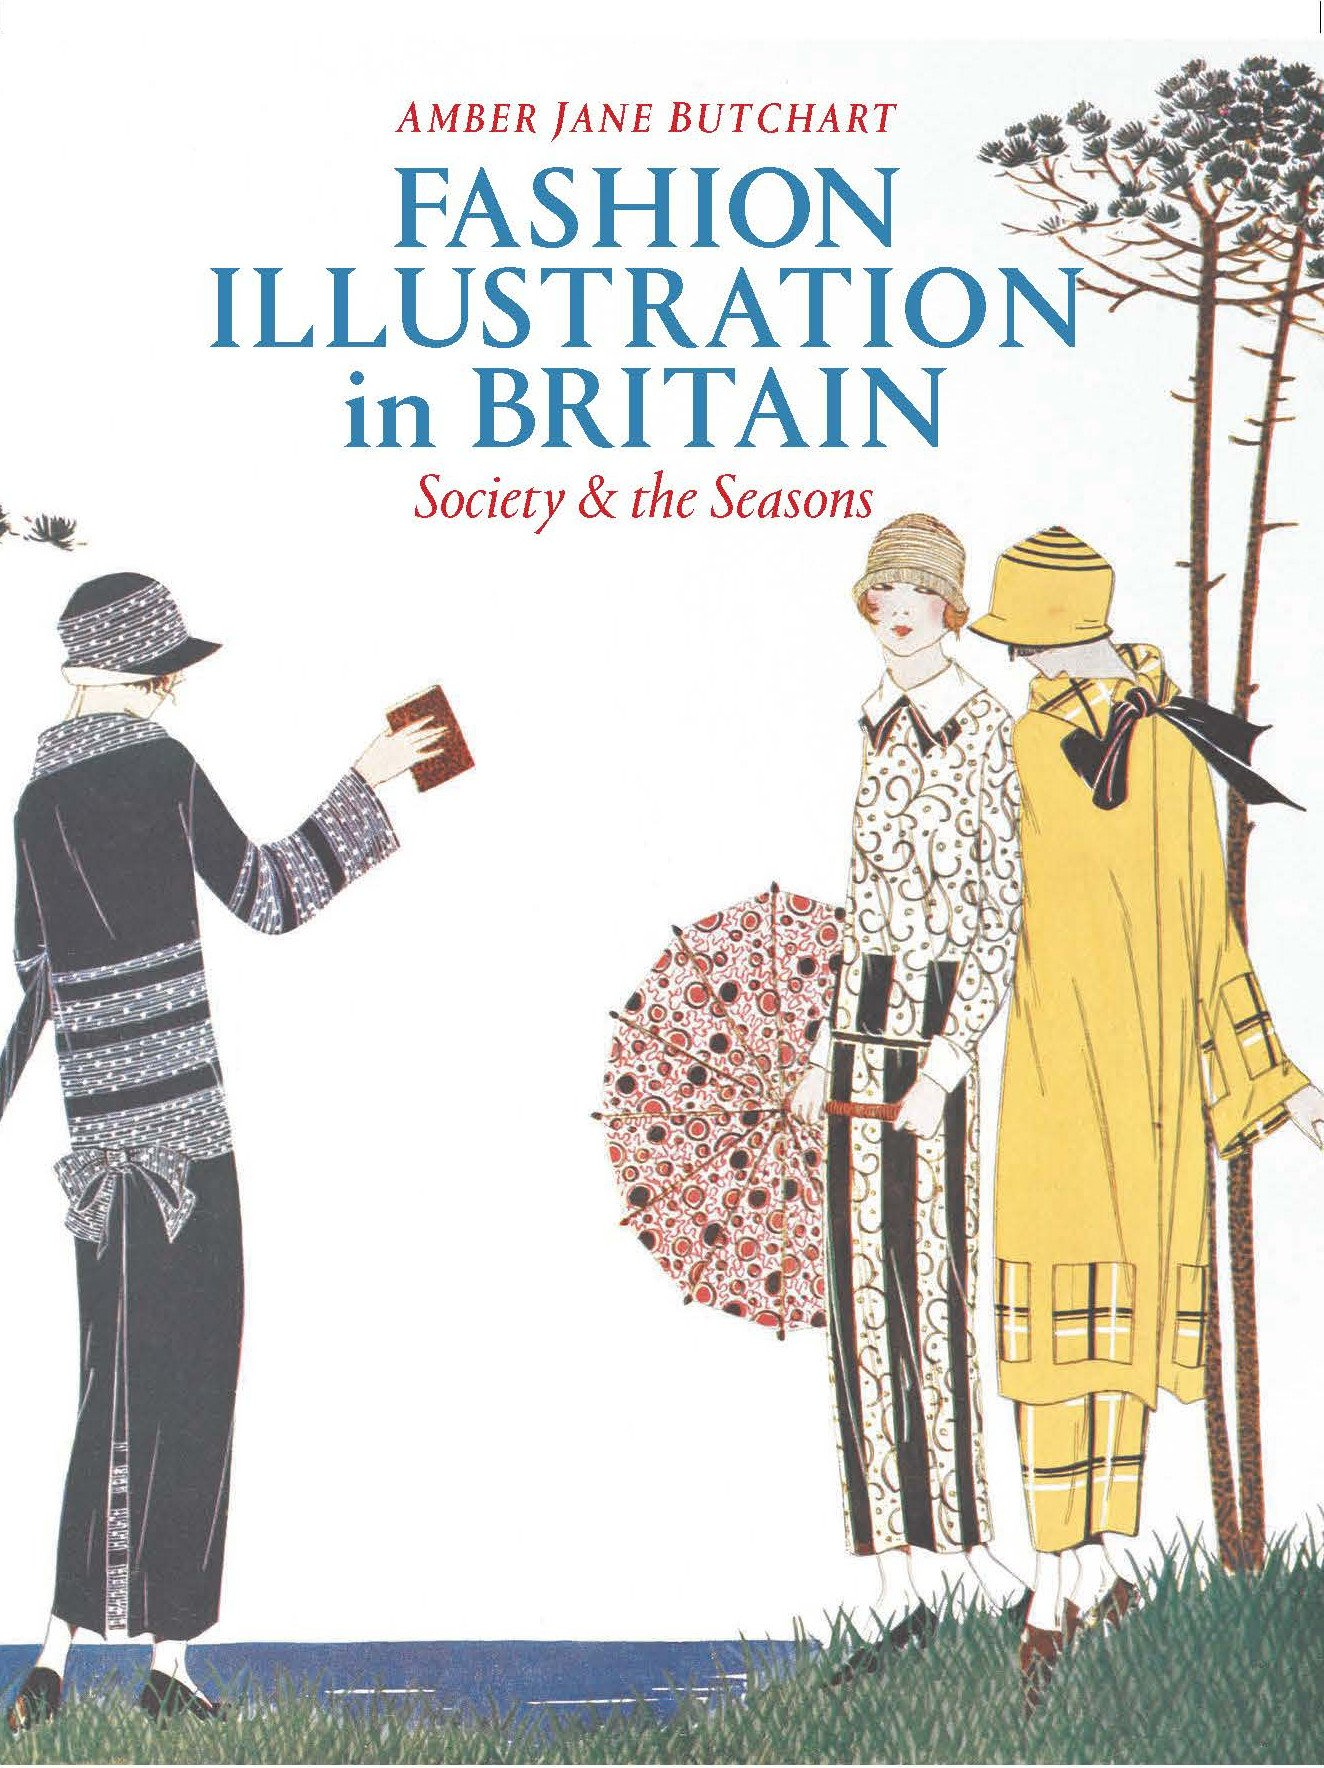 Fashion Illustration in Britain: Society & the Seasons